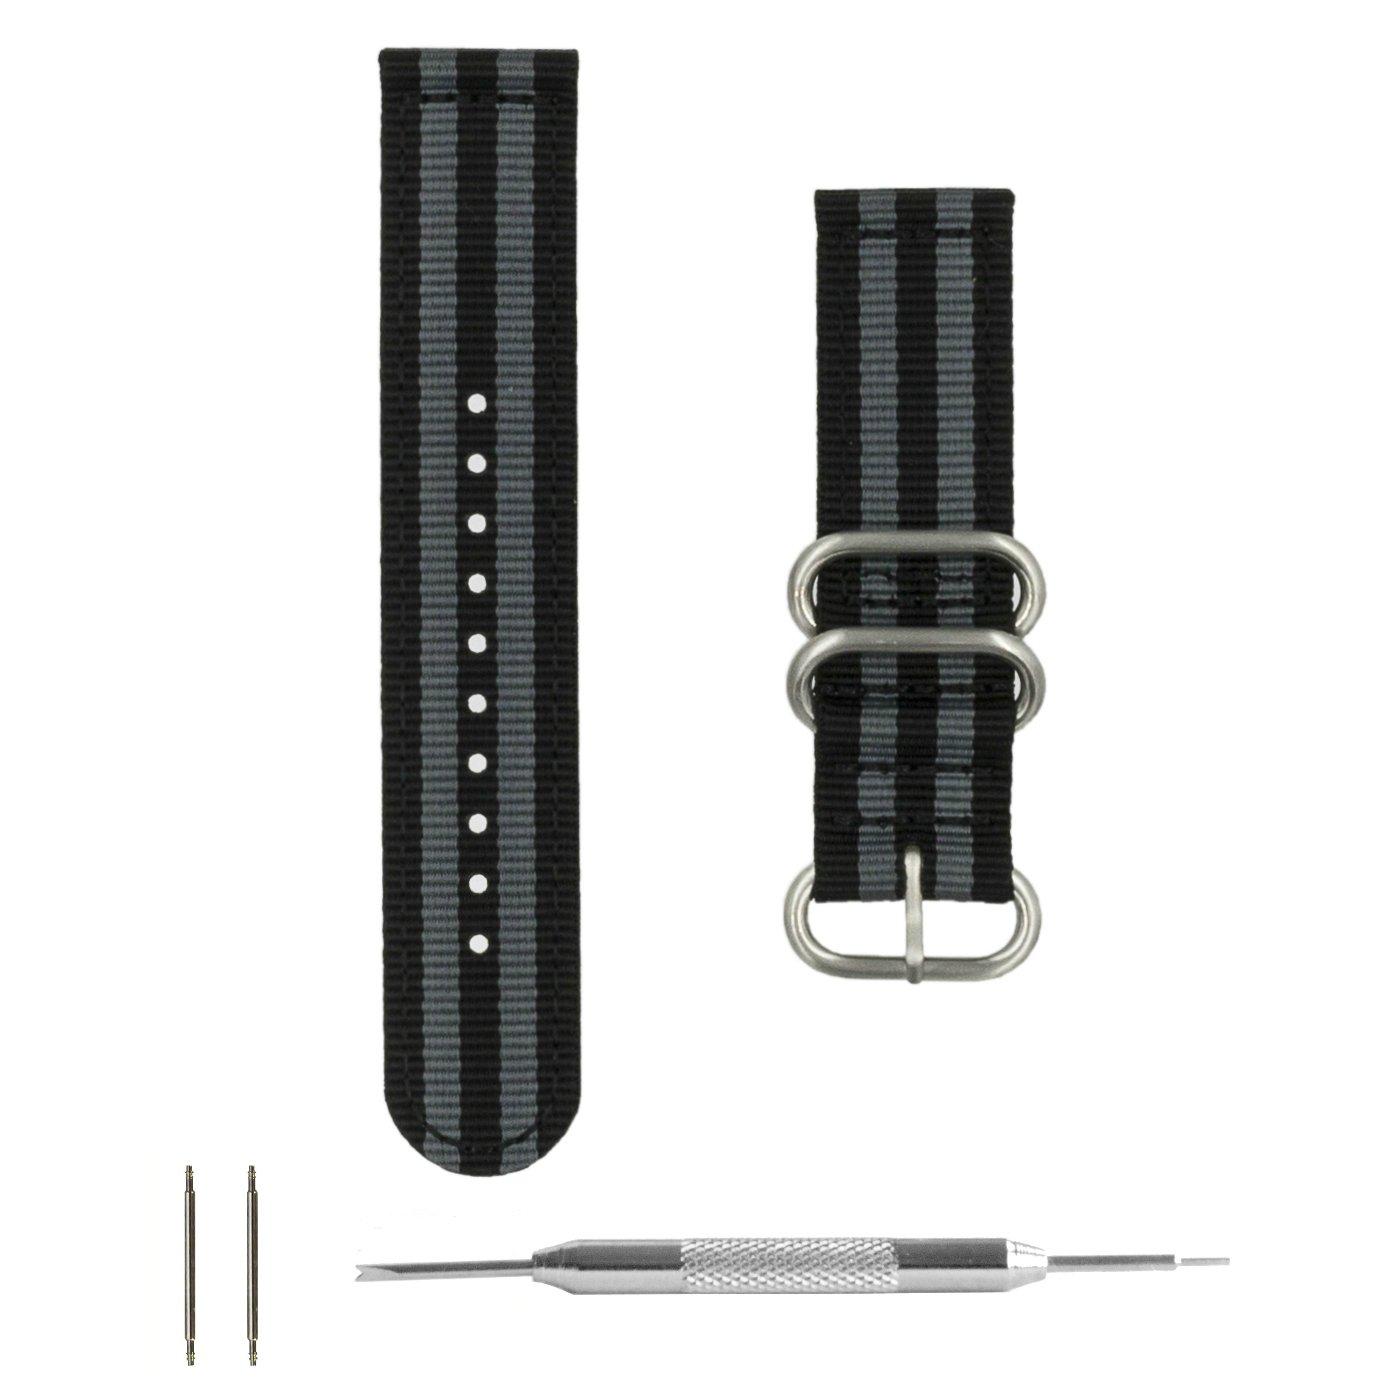 Benchmark Straps 20 & 22mm Ballistic Nylon Zulu Watchband + Spring Bar Removal Tool by Benchmark Straps